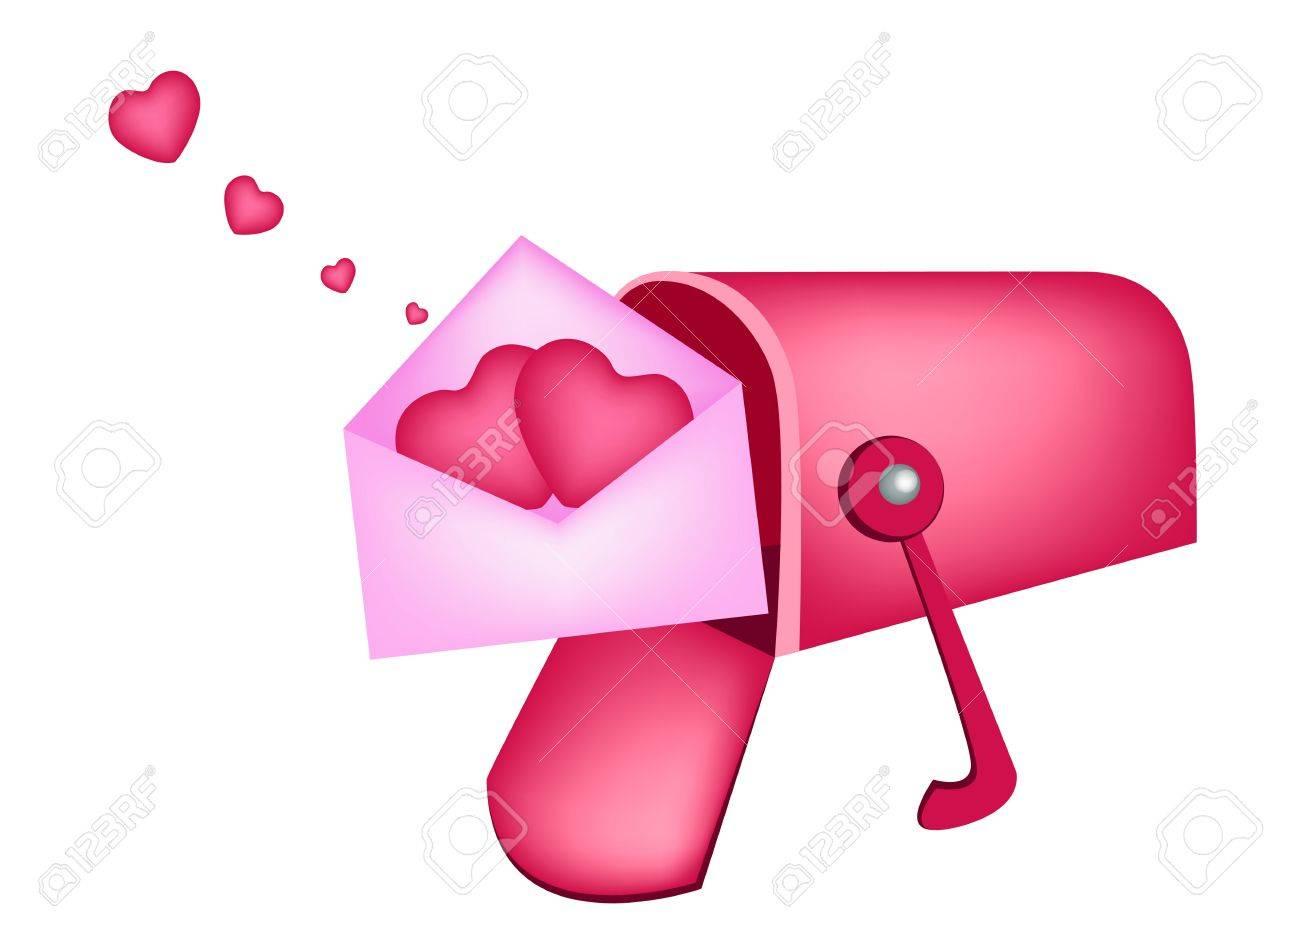 1300x945 An Open Standard Mailbox Or Letter Box Receiving Love Letter